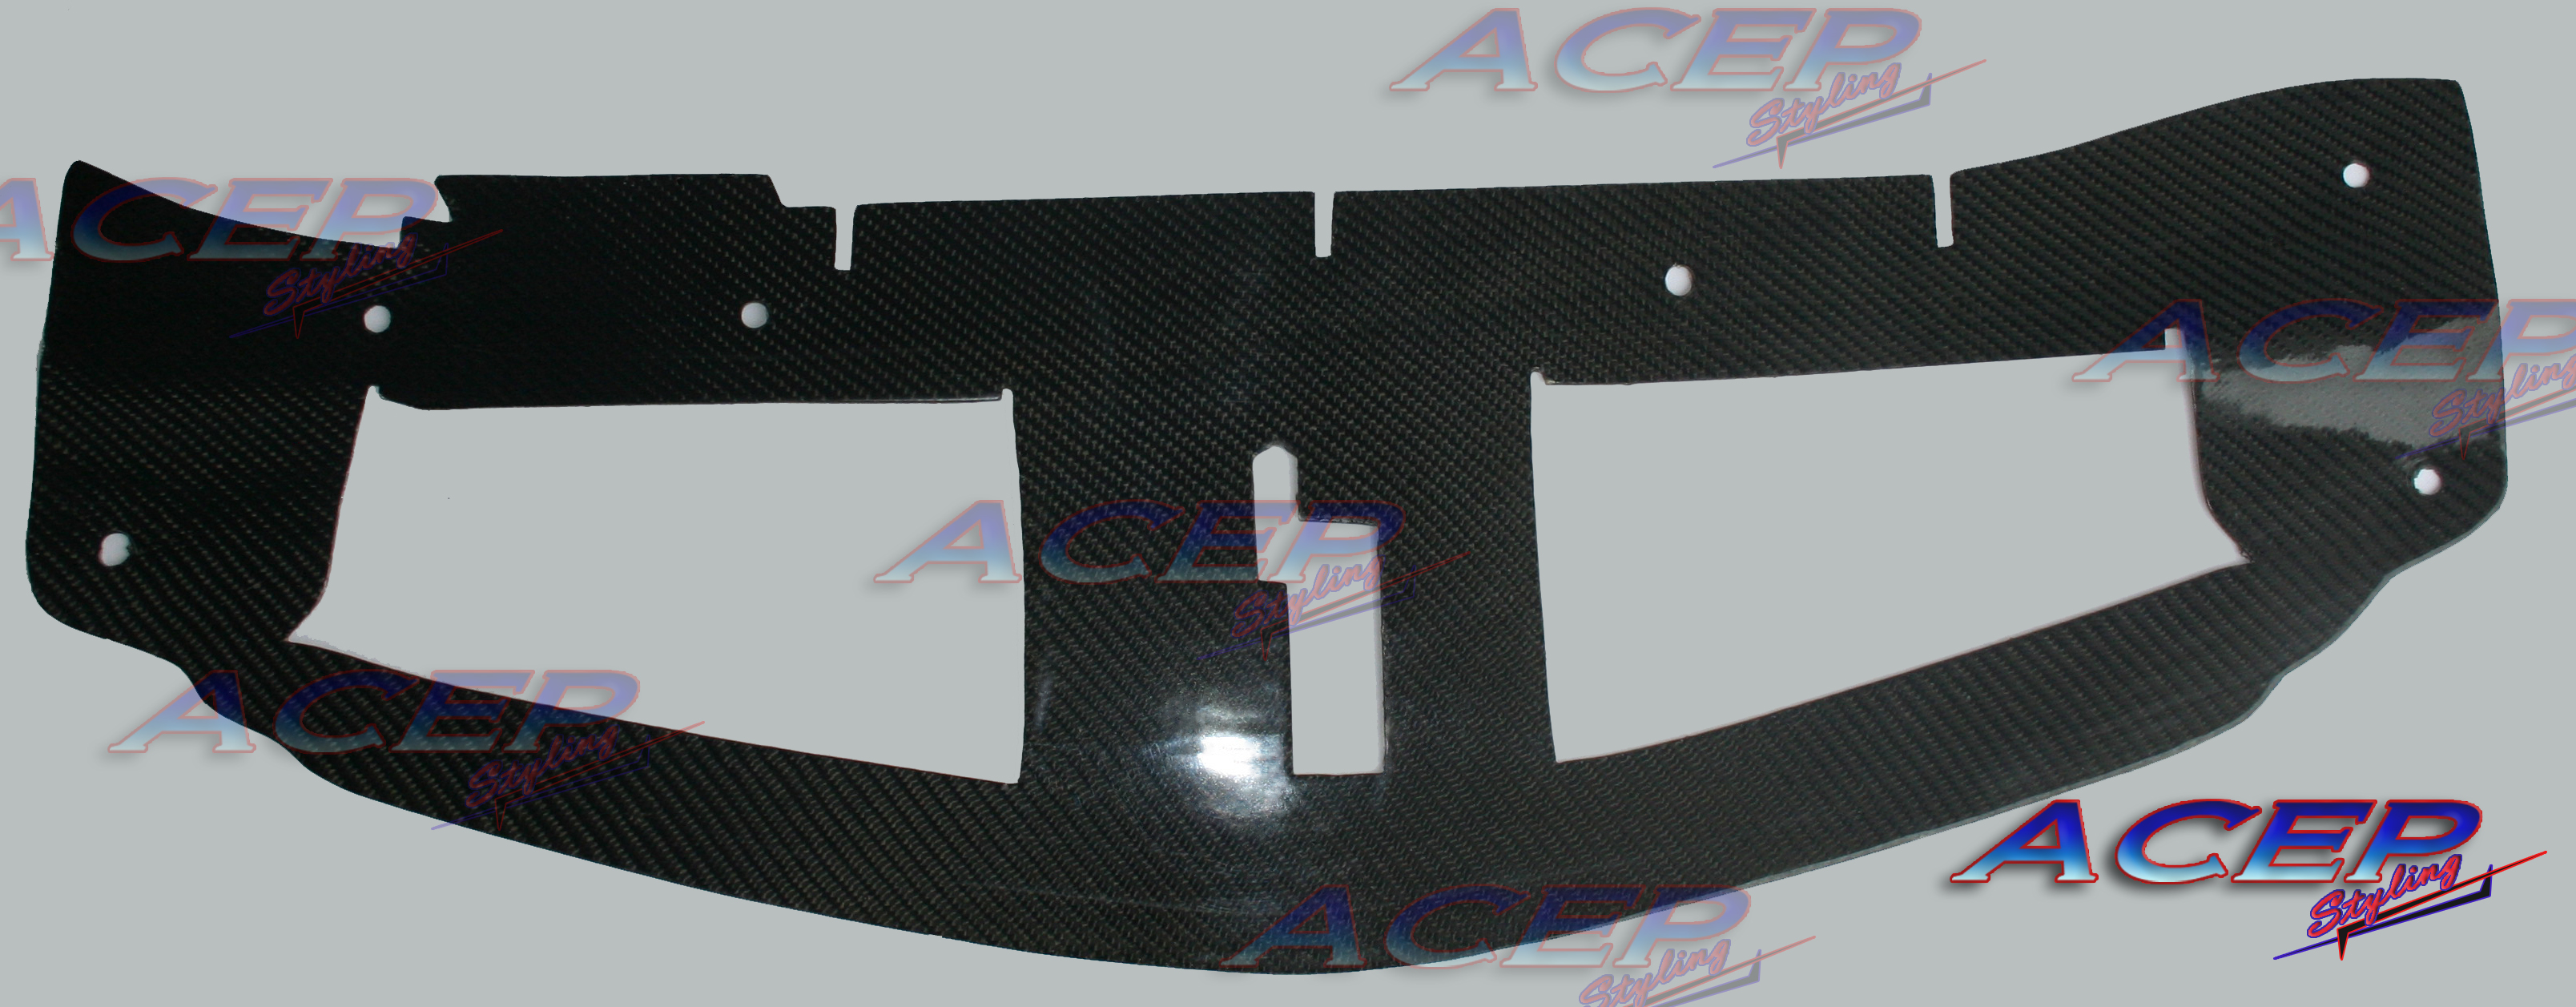 z3-coolant-platecf1.jpg